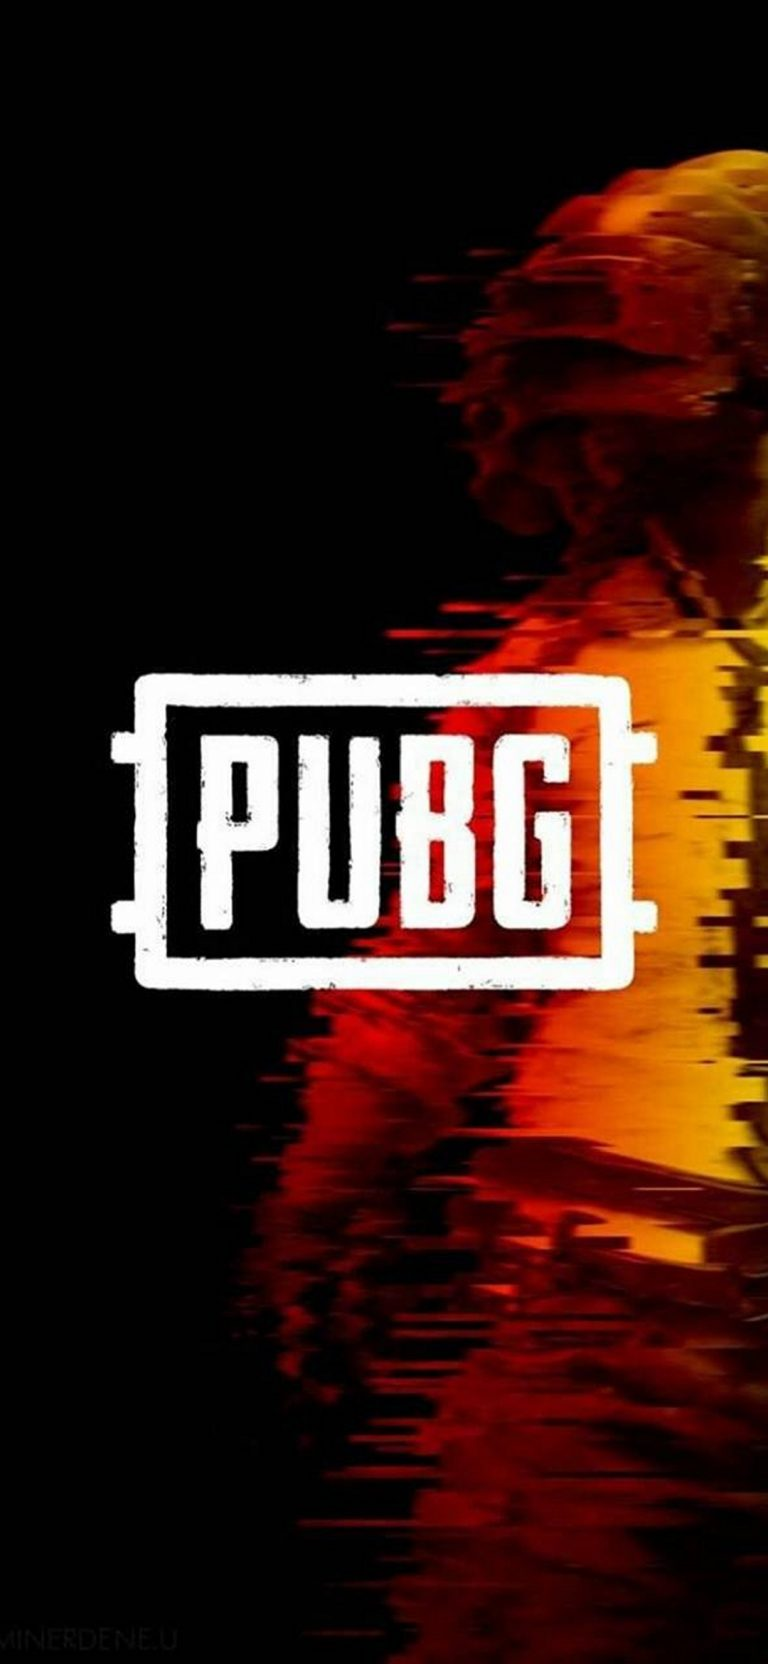 PUBG Phone Wallpaper 18 1080x2340 768x1664